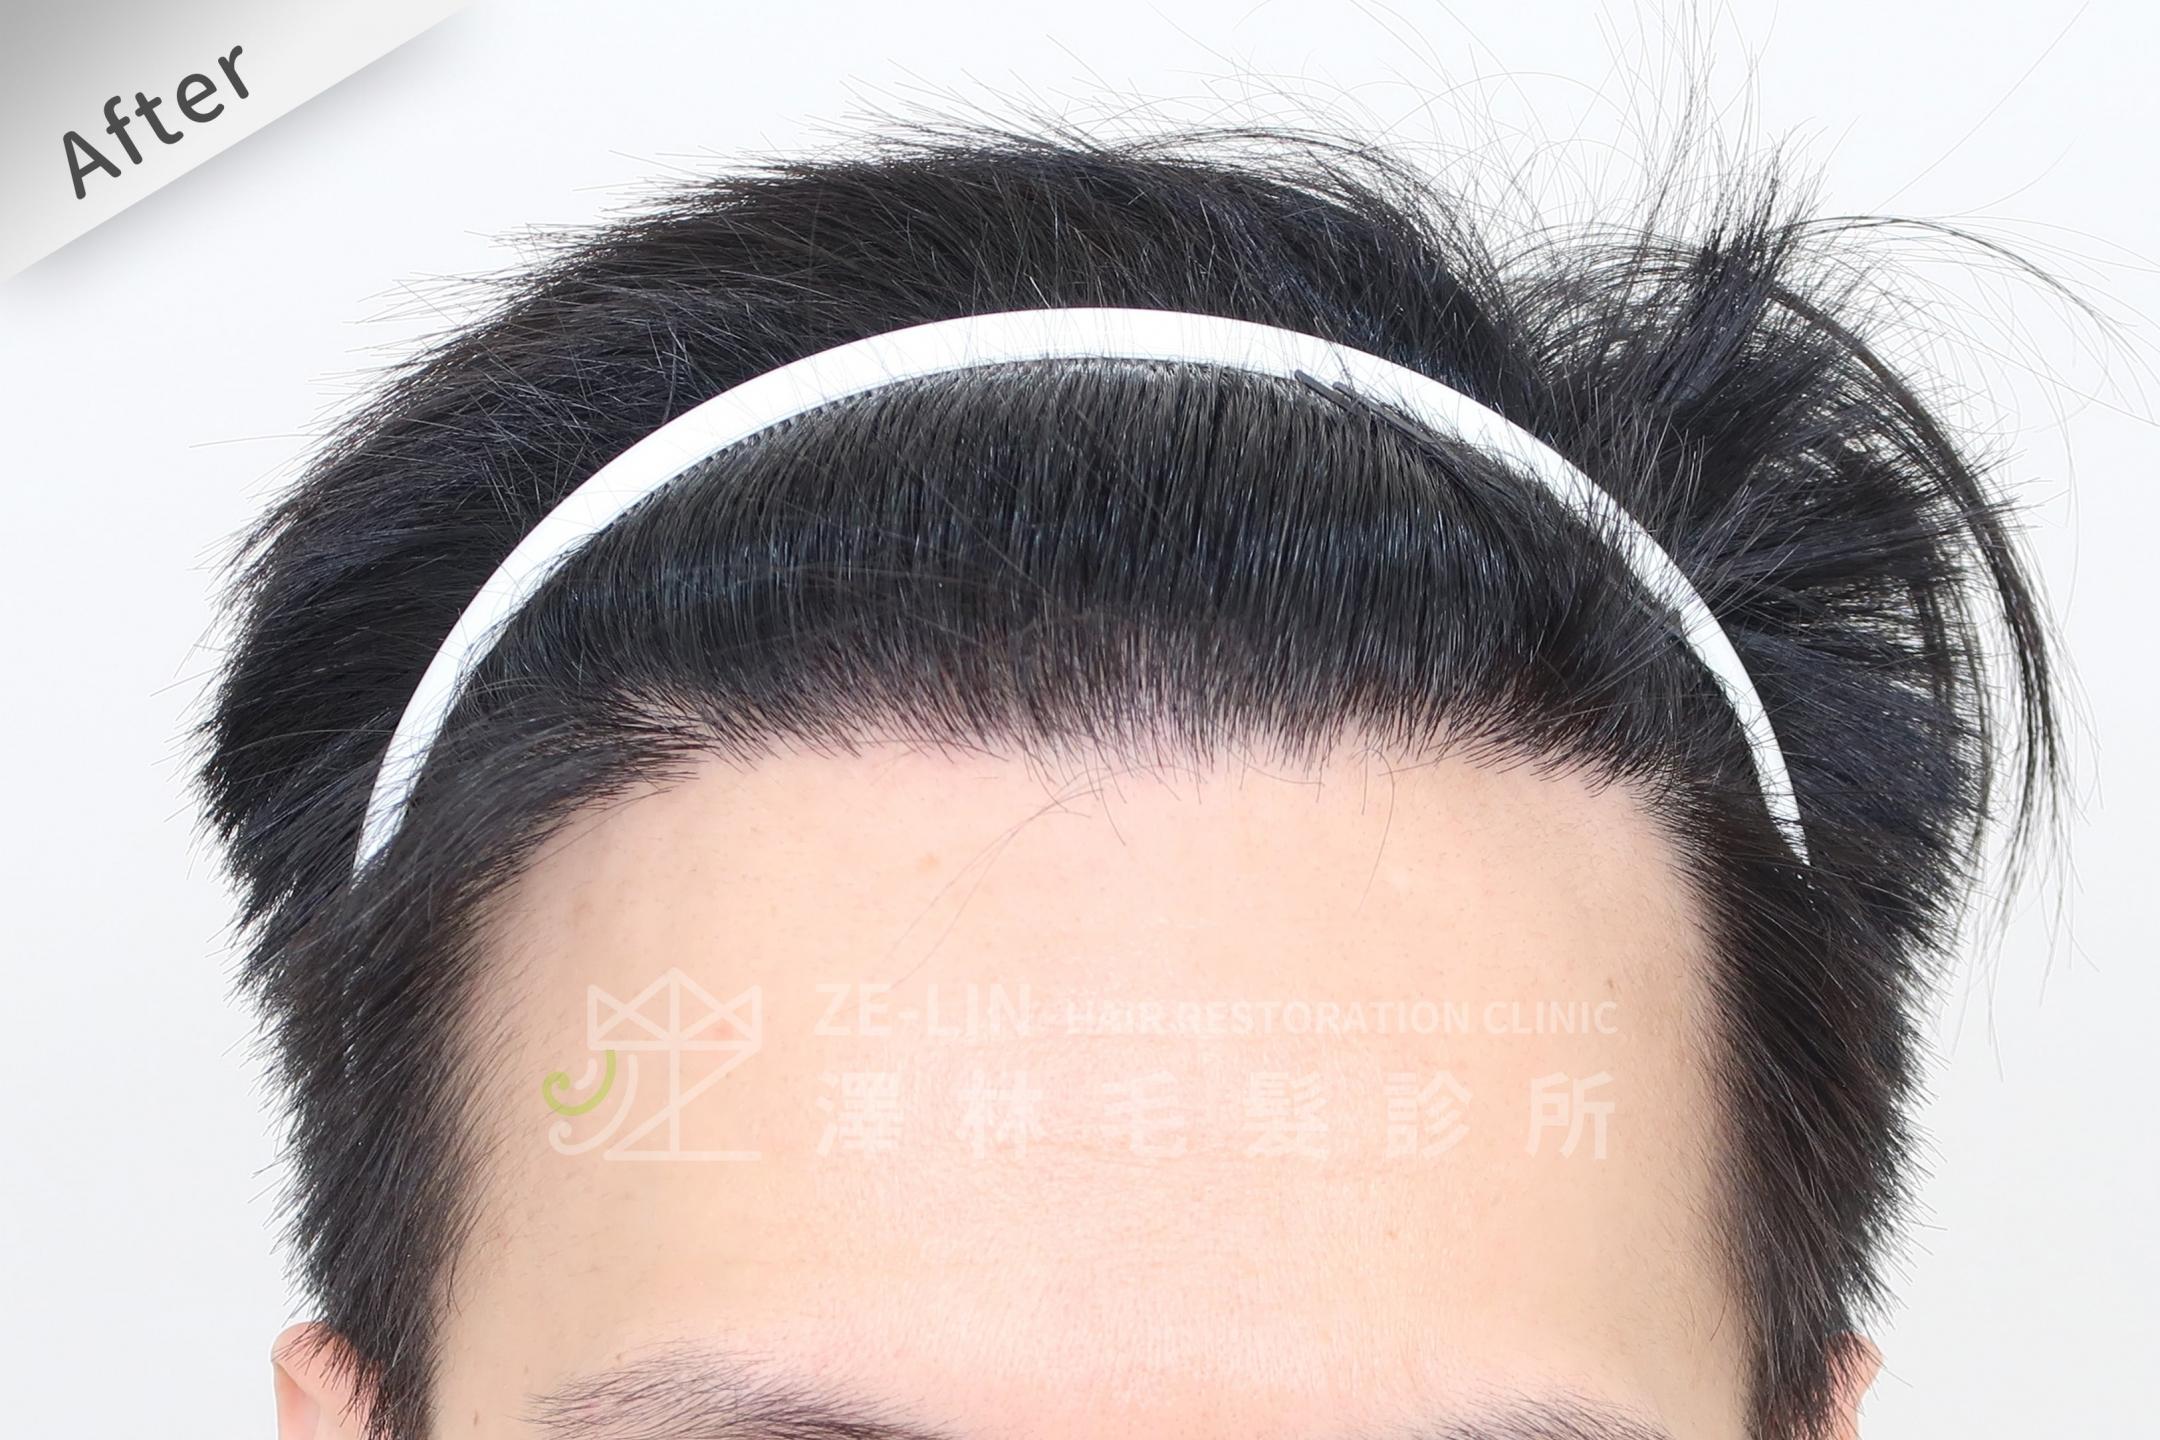 M型雄性髮際線FUE植髮手術-澤林毛髮診所植髮推薦-案例心得分享術後